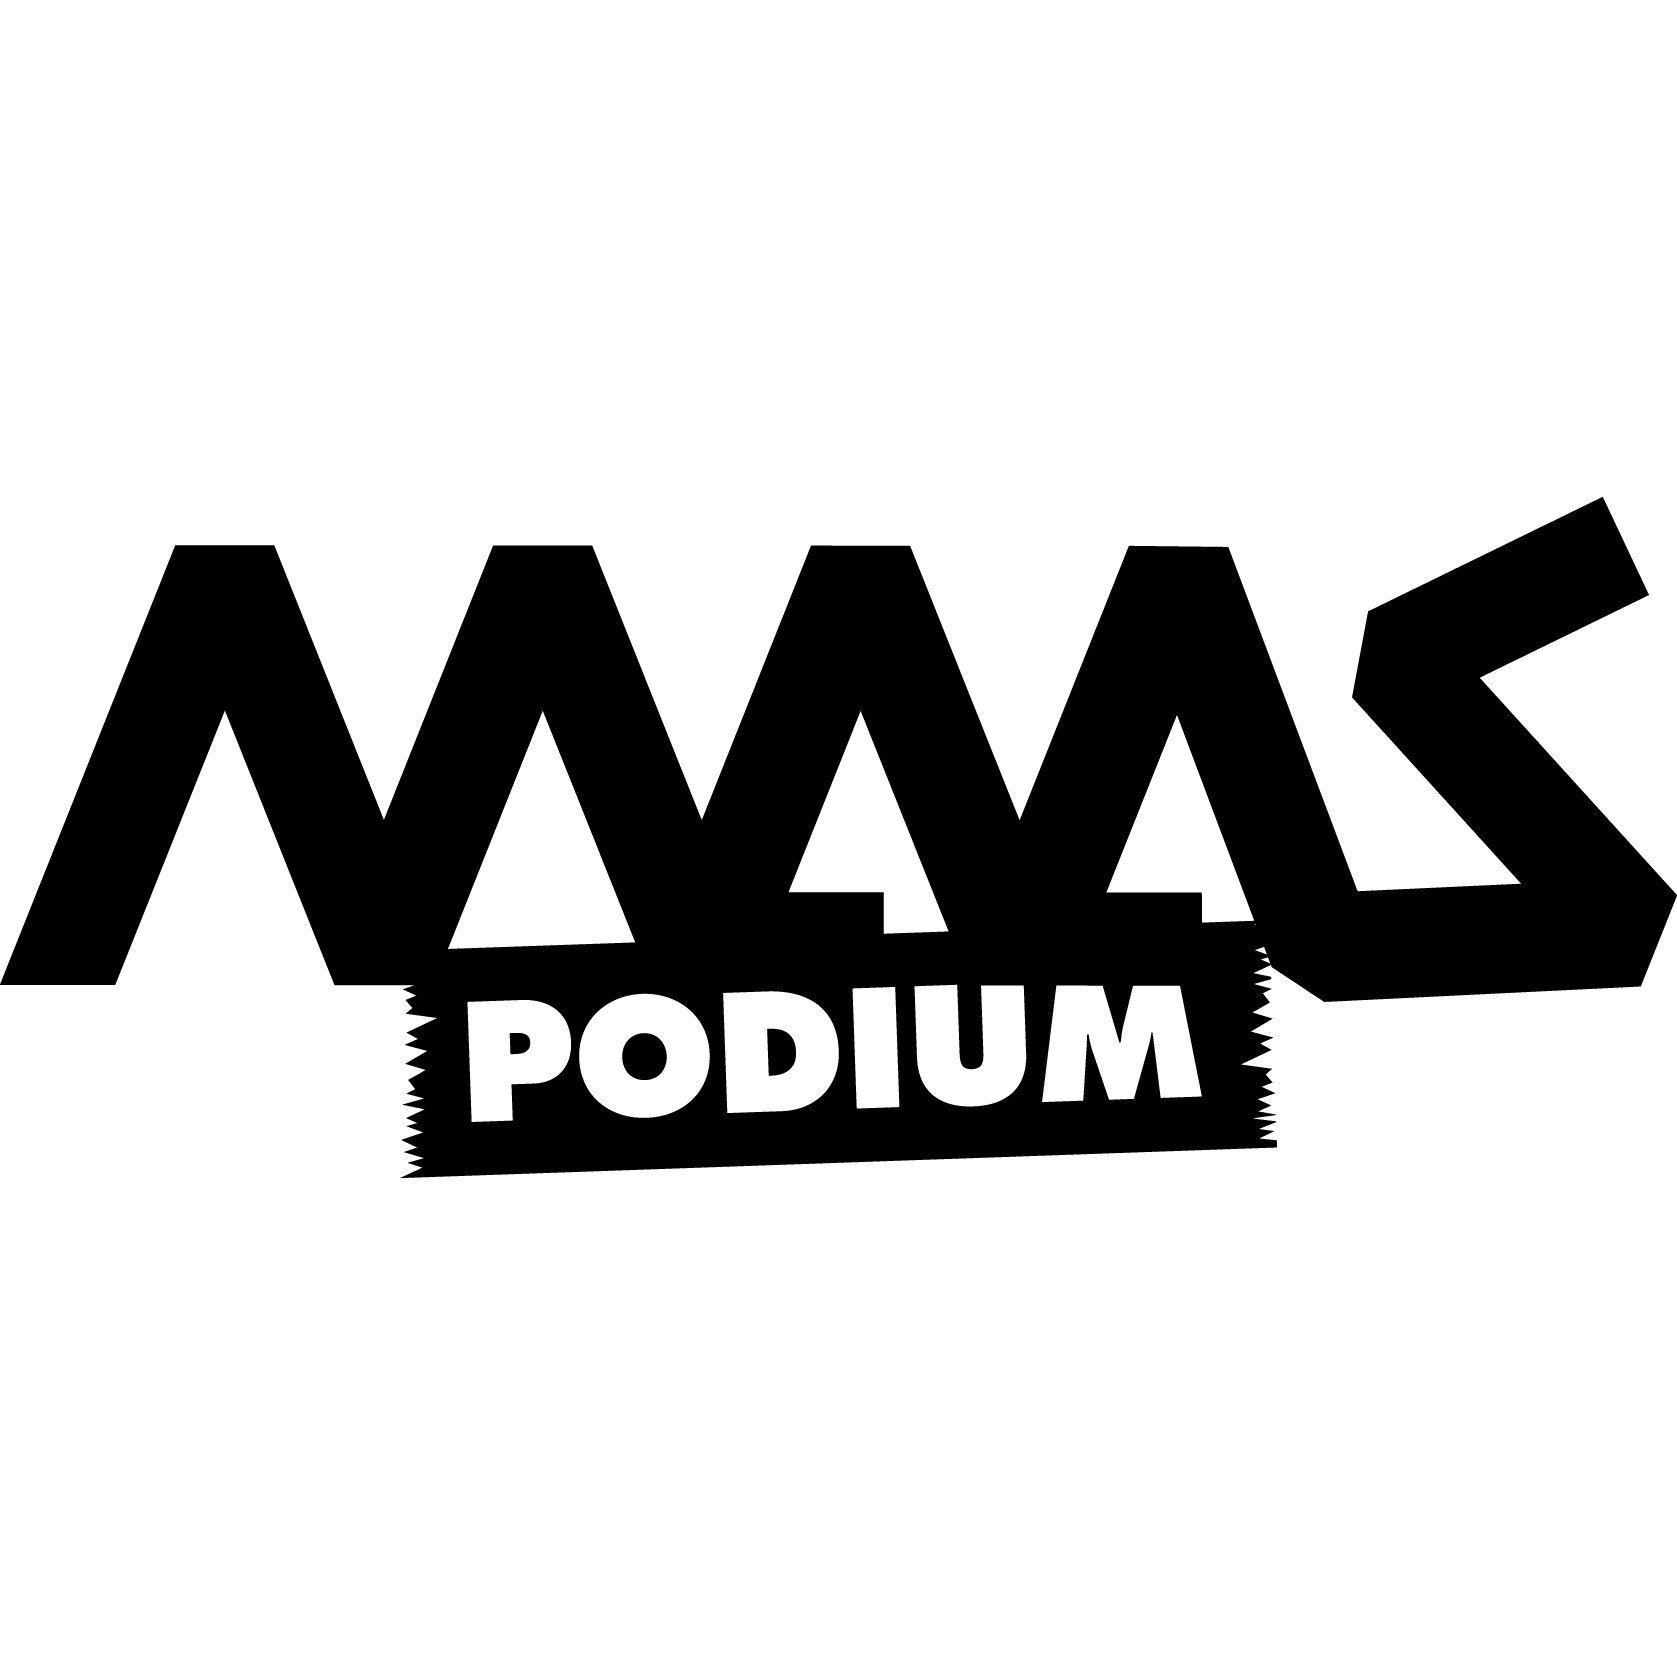 Maas Podium